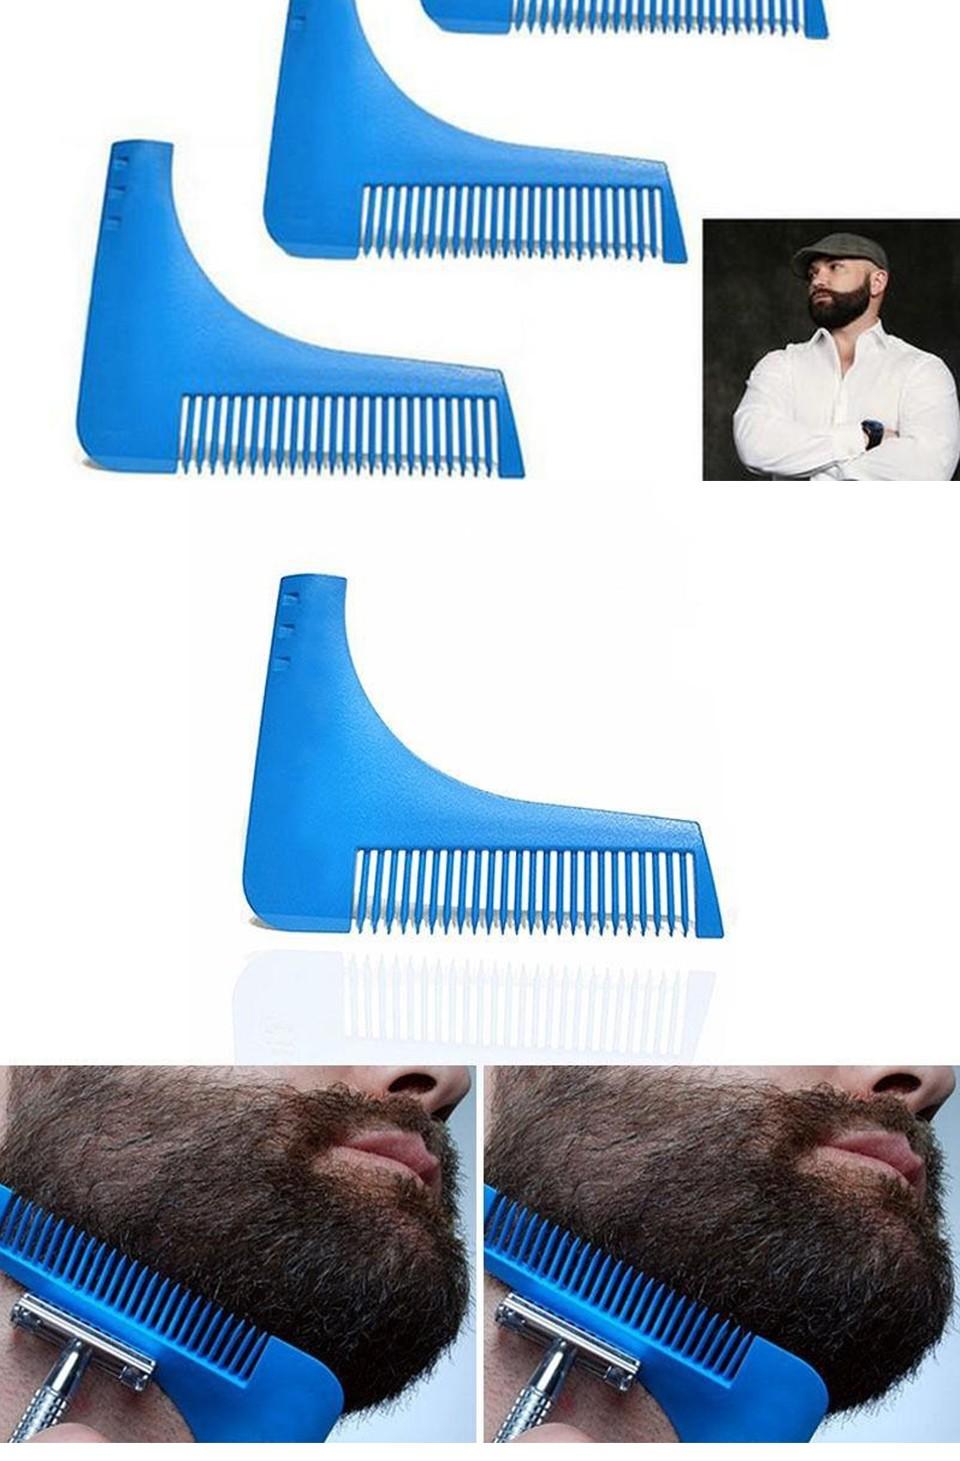 3pcs natural wooden beard comb boar bristle hair brush lice comb men beard apron barber salon cape hairdressing for haircut 16